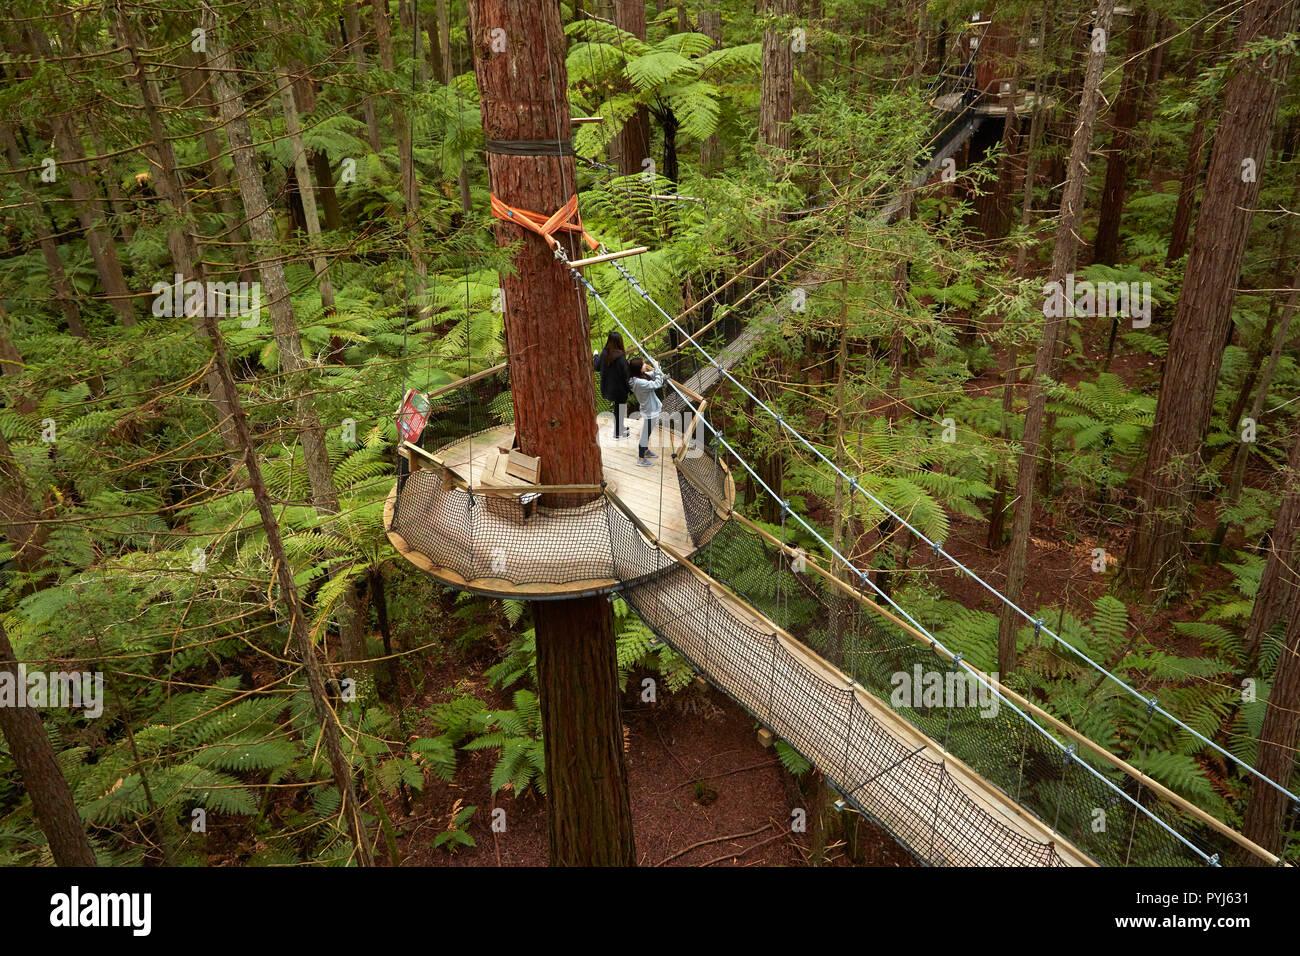 Tourists on Redwoods Treewalk at The Redwoods (Whakarewarewa Forest), Rotorua, North Island, New Zealand - Stock Image